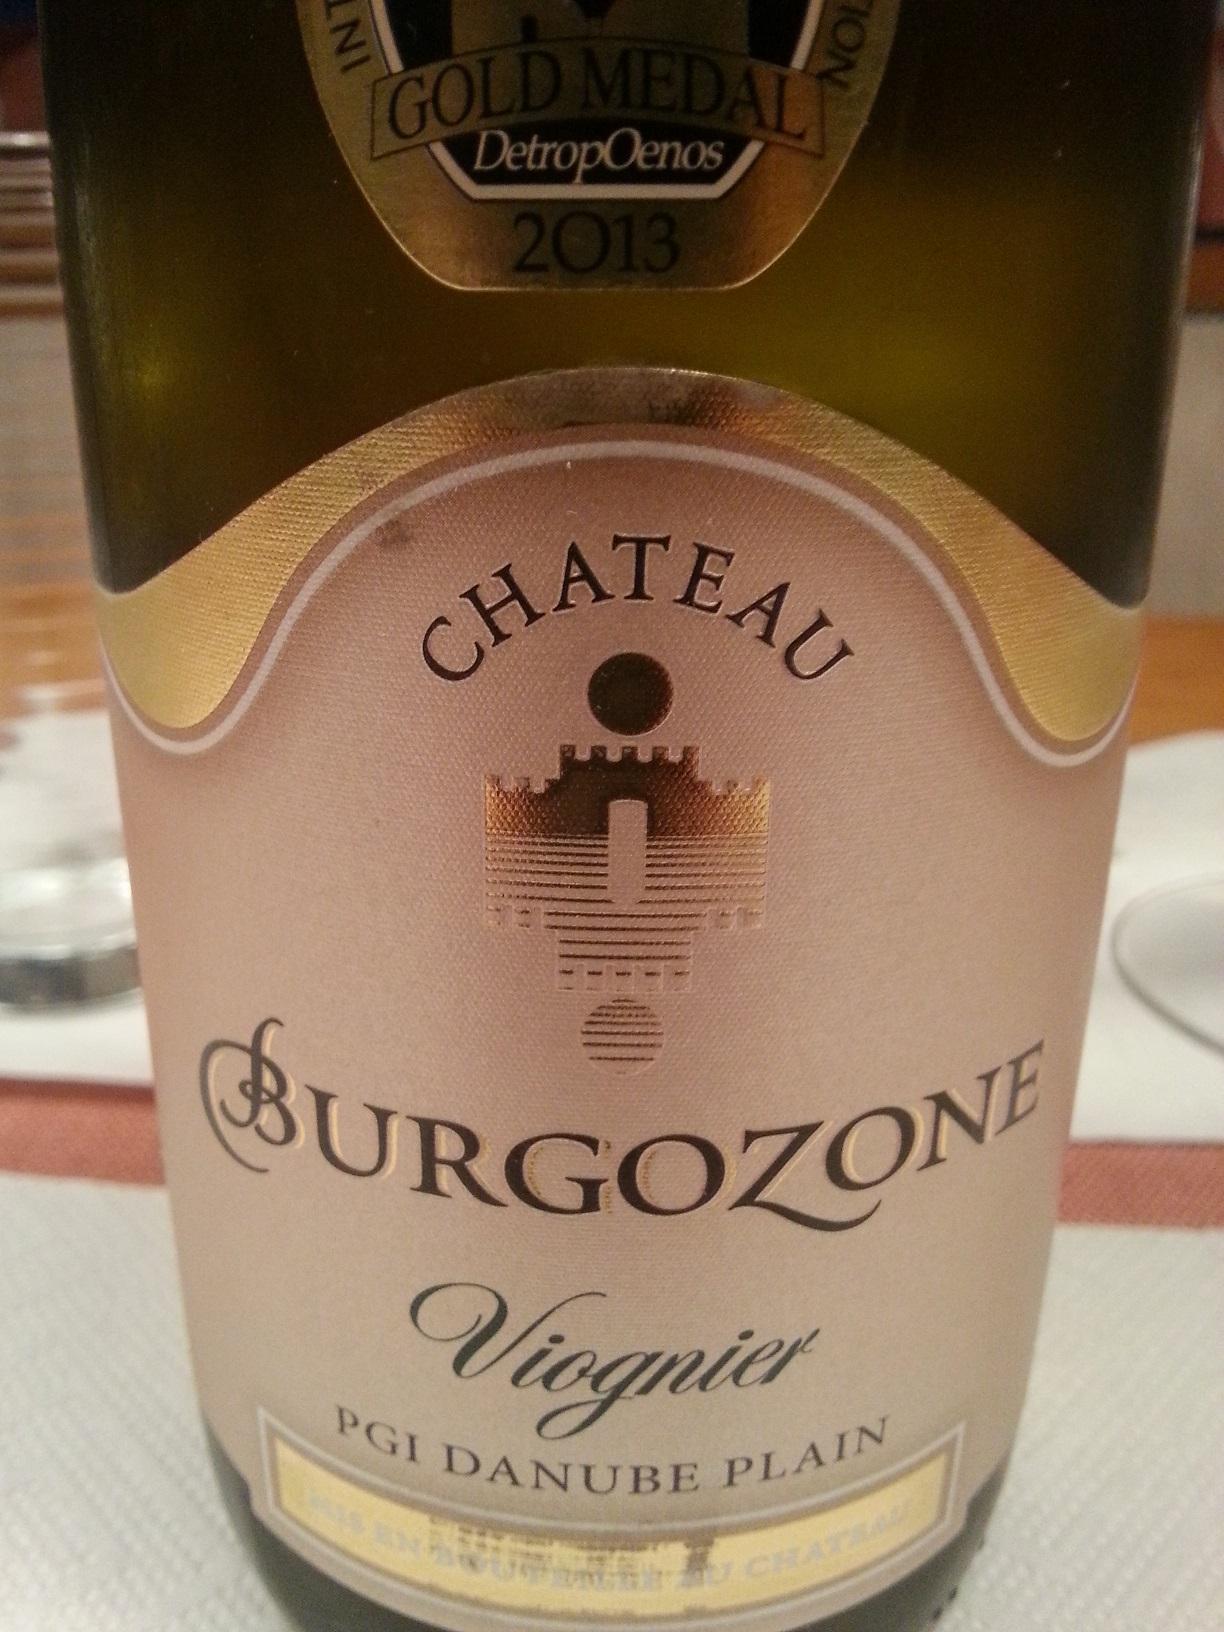 2012 Viognier | Burgozone